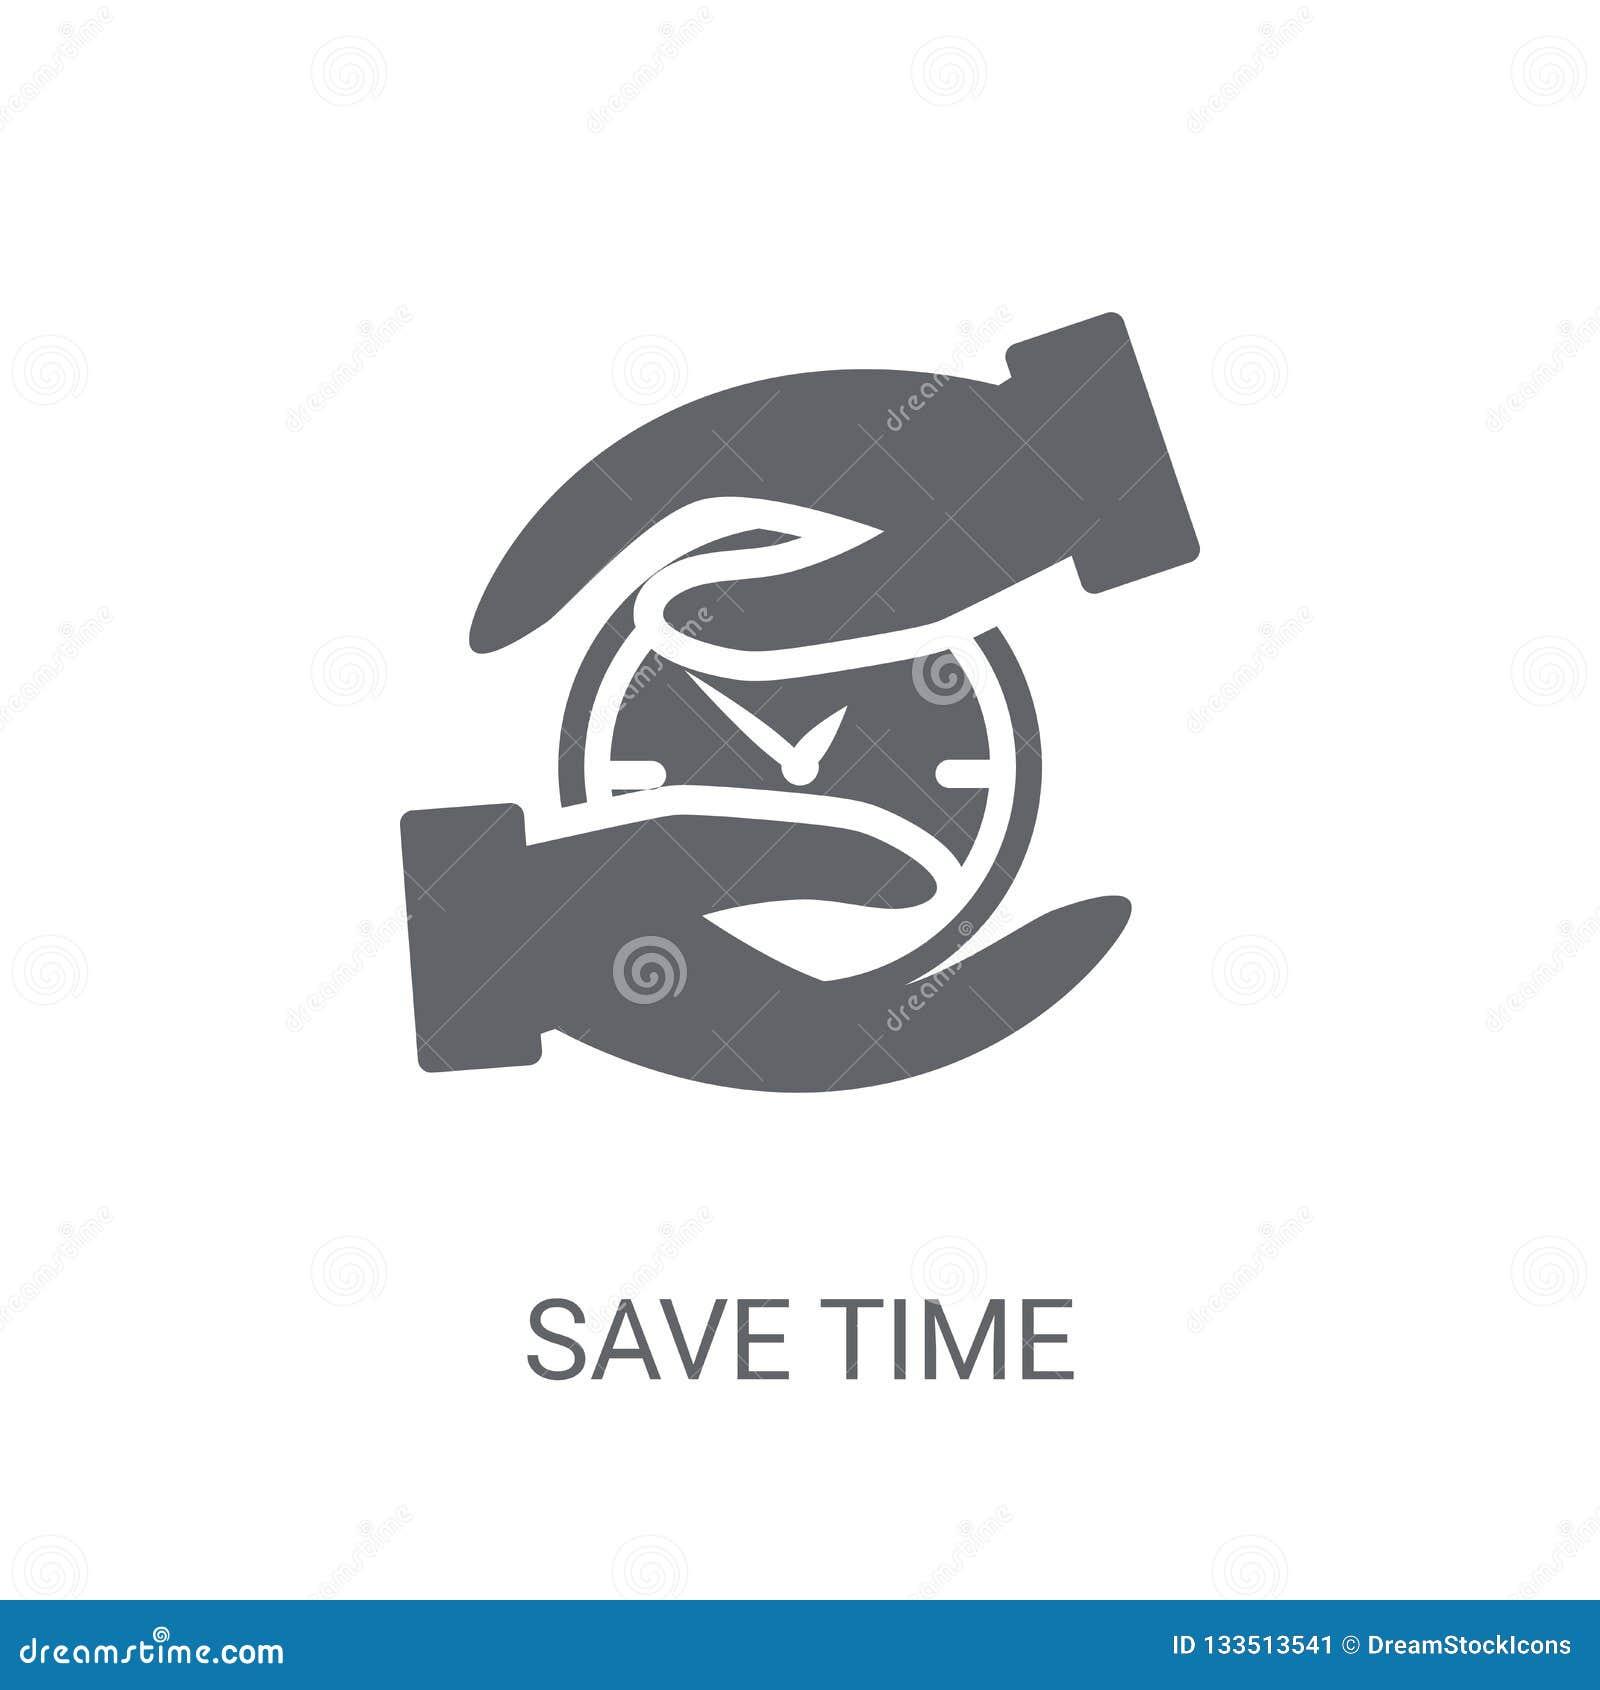 Save time icon. Trendy Save time logo concept on white backgroun